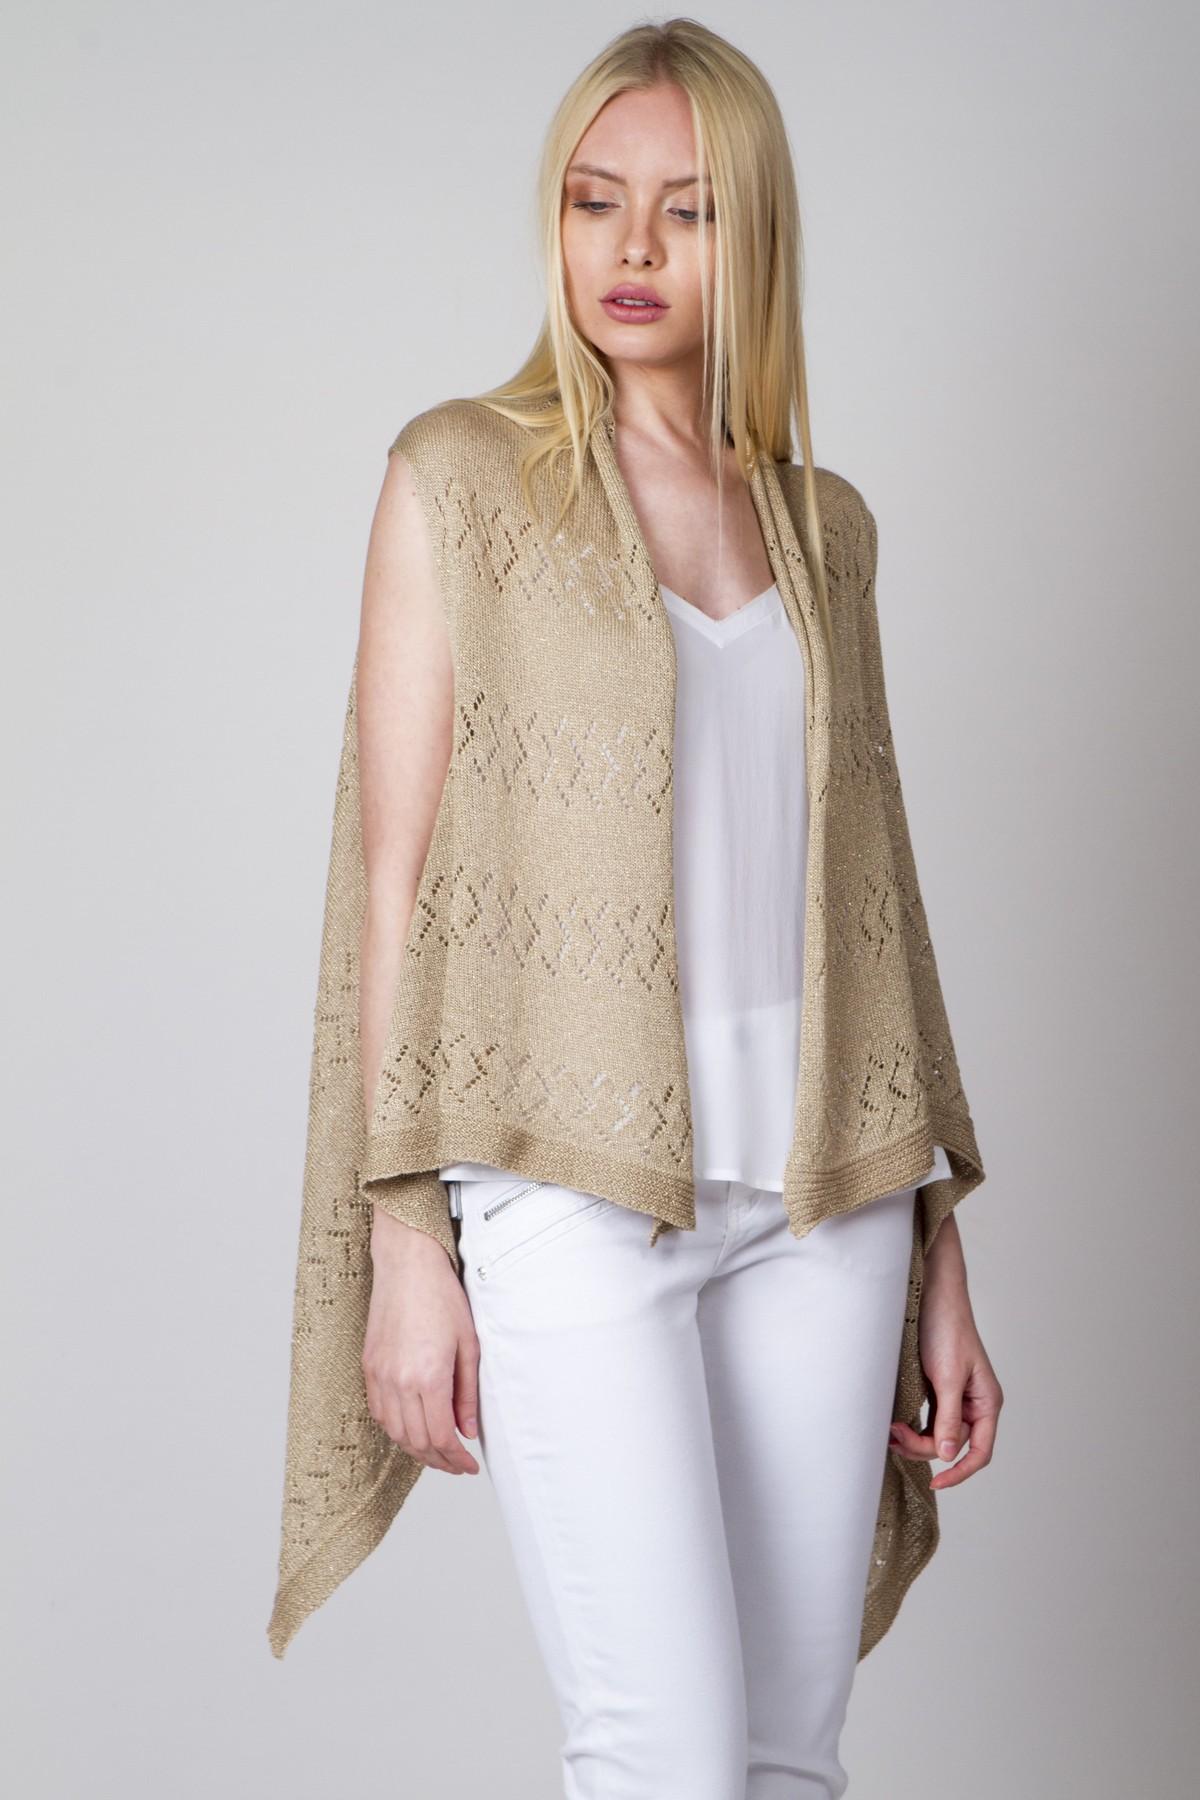 Sleeveless cardigan with holes in knitting - aggel.eu